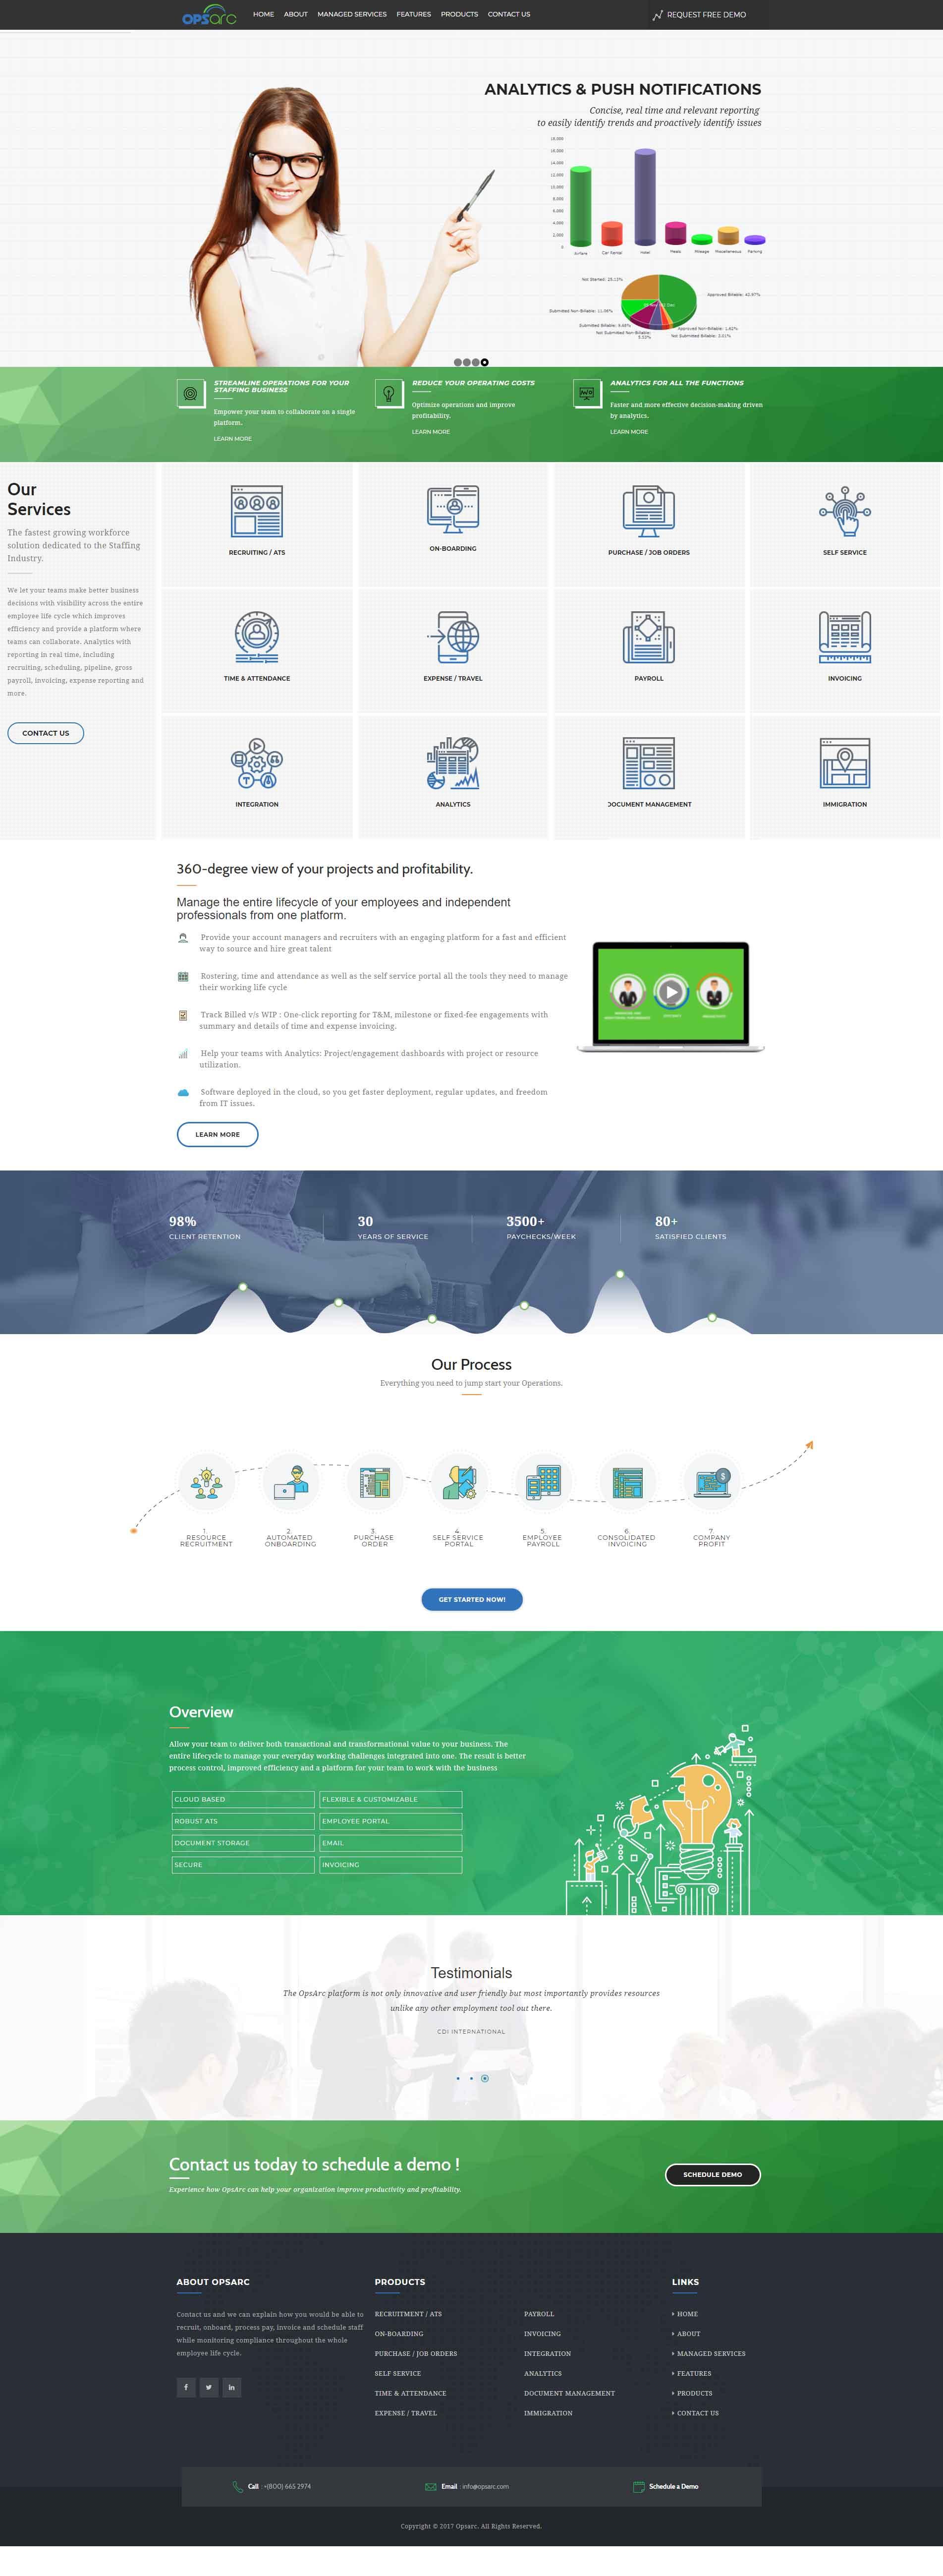 Staffing solutions web application design 5 bk website - Web application home page design ...